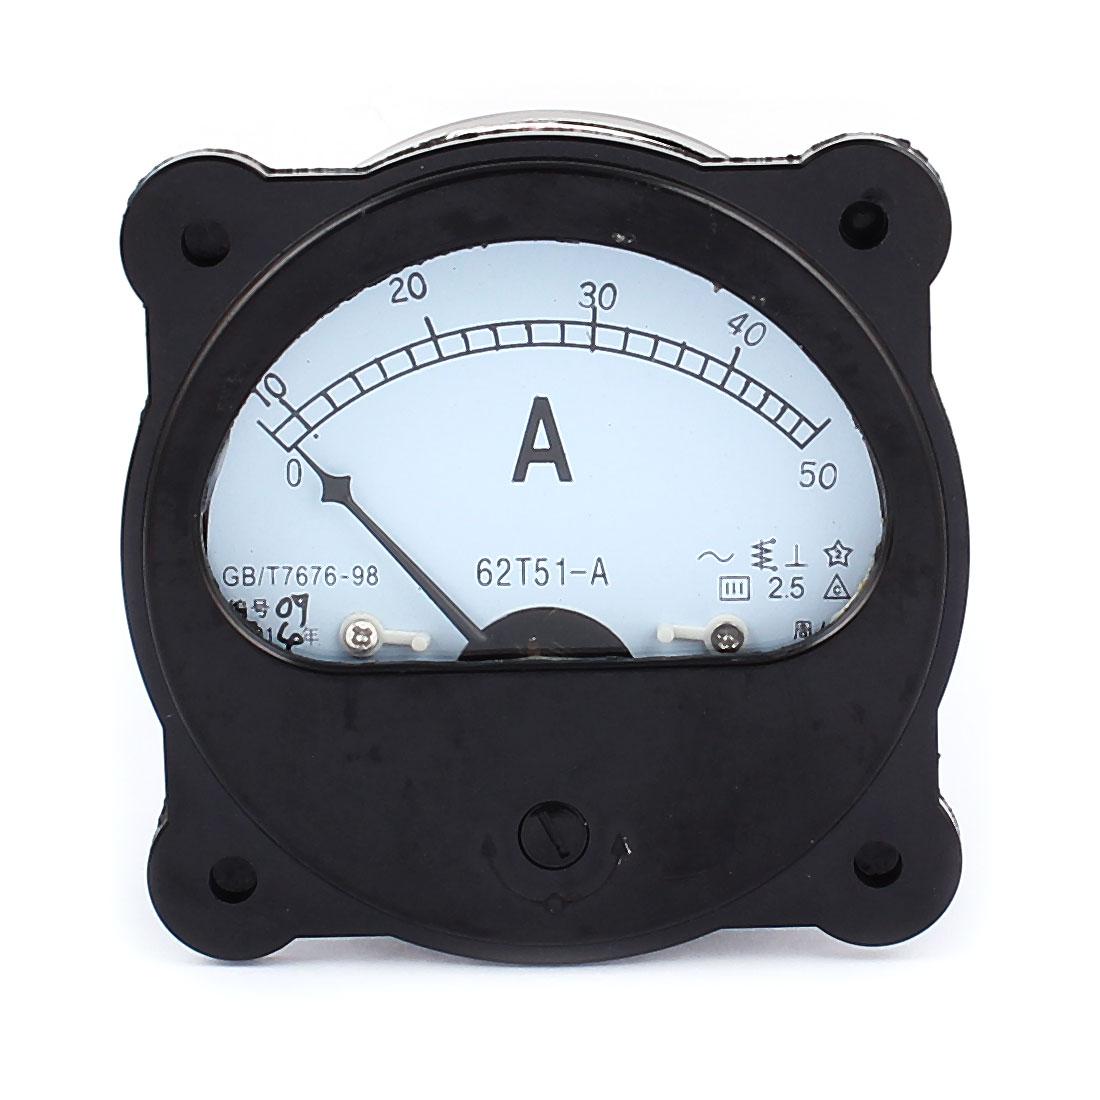 AC 0-50A Dial Panel Analog Ampere Meter Amperemeter Black